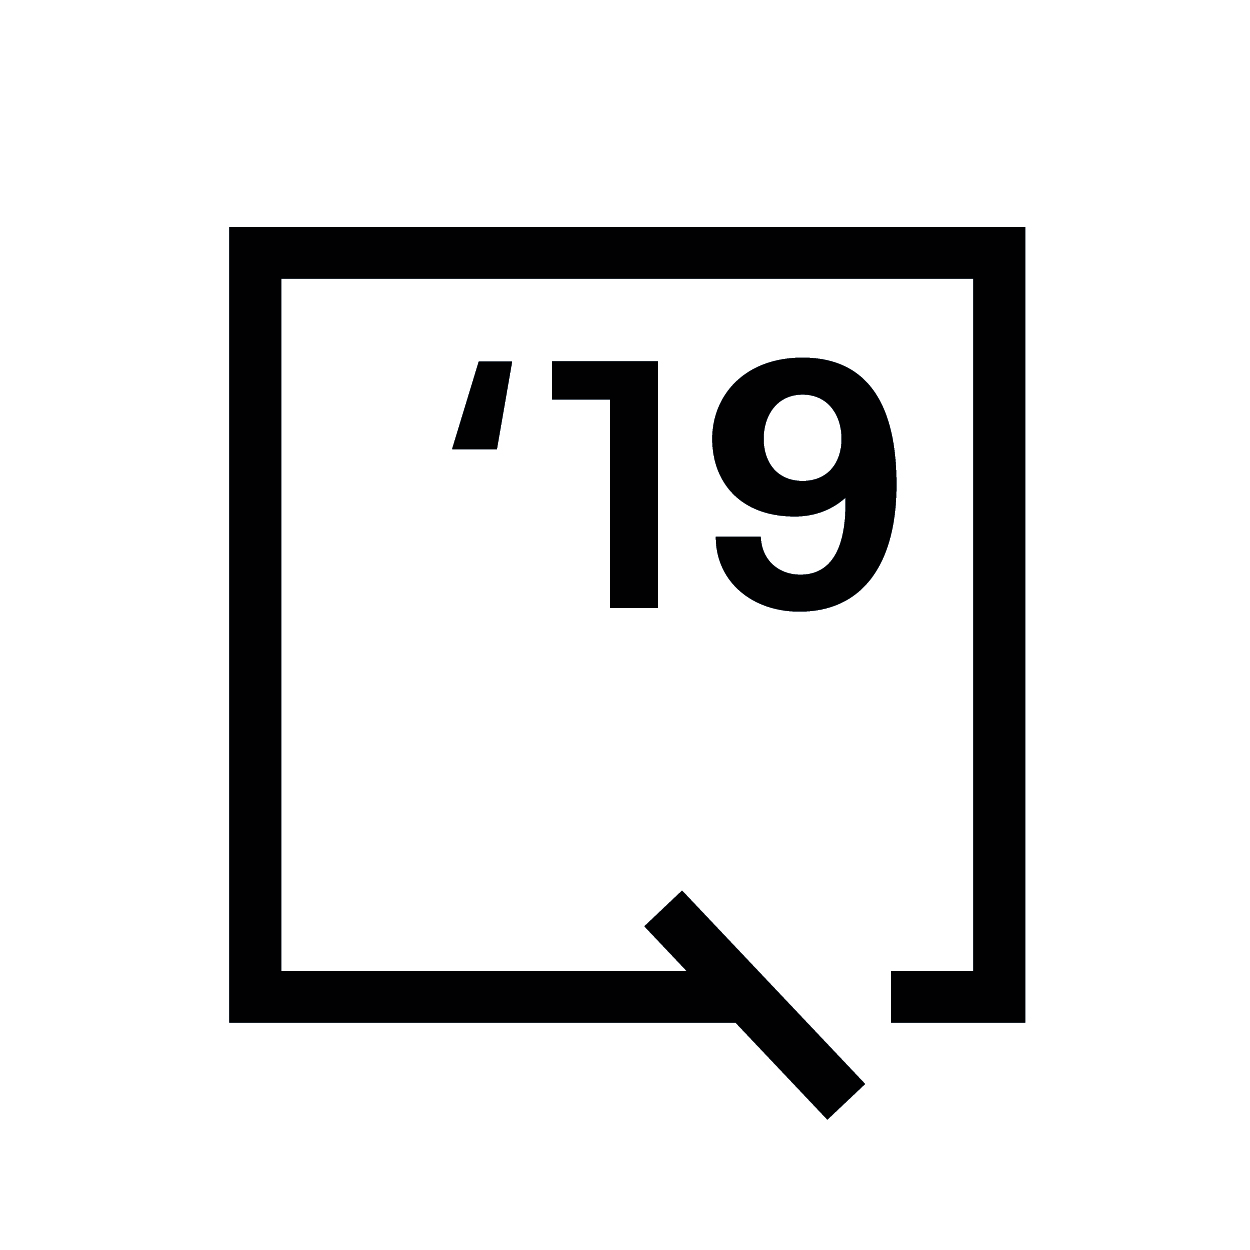 kvadrienale 19-01